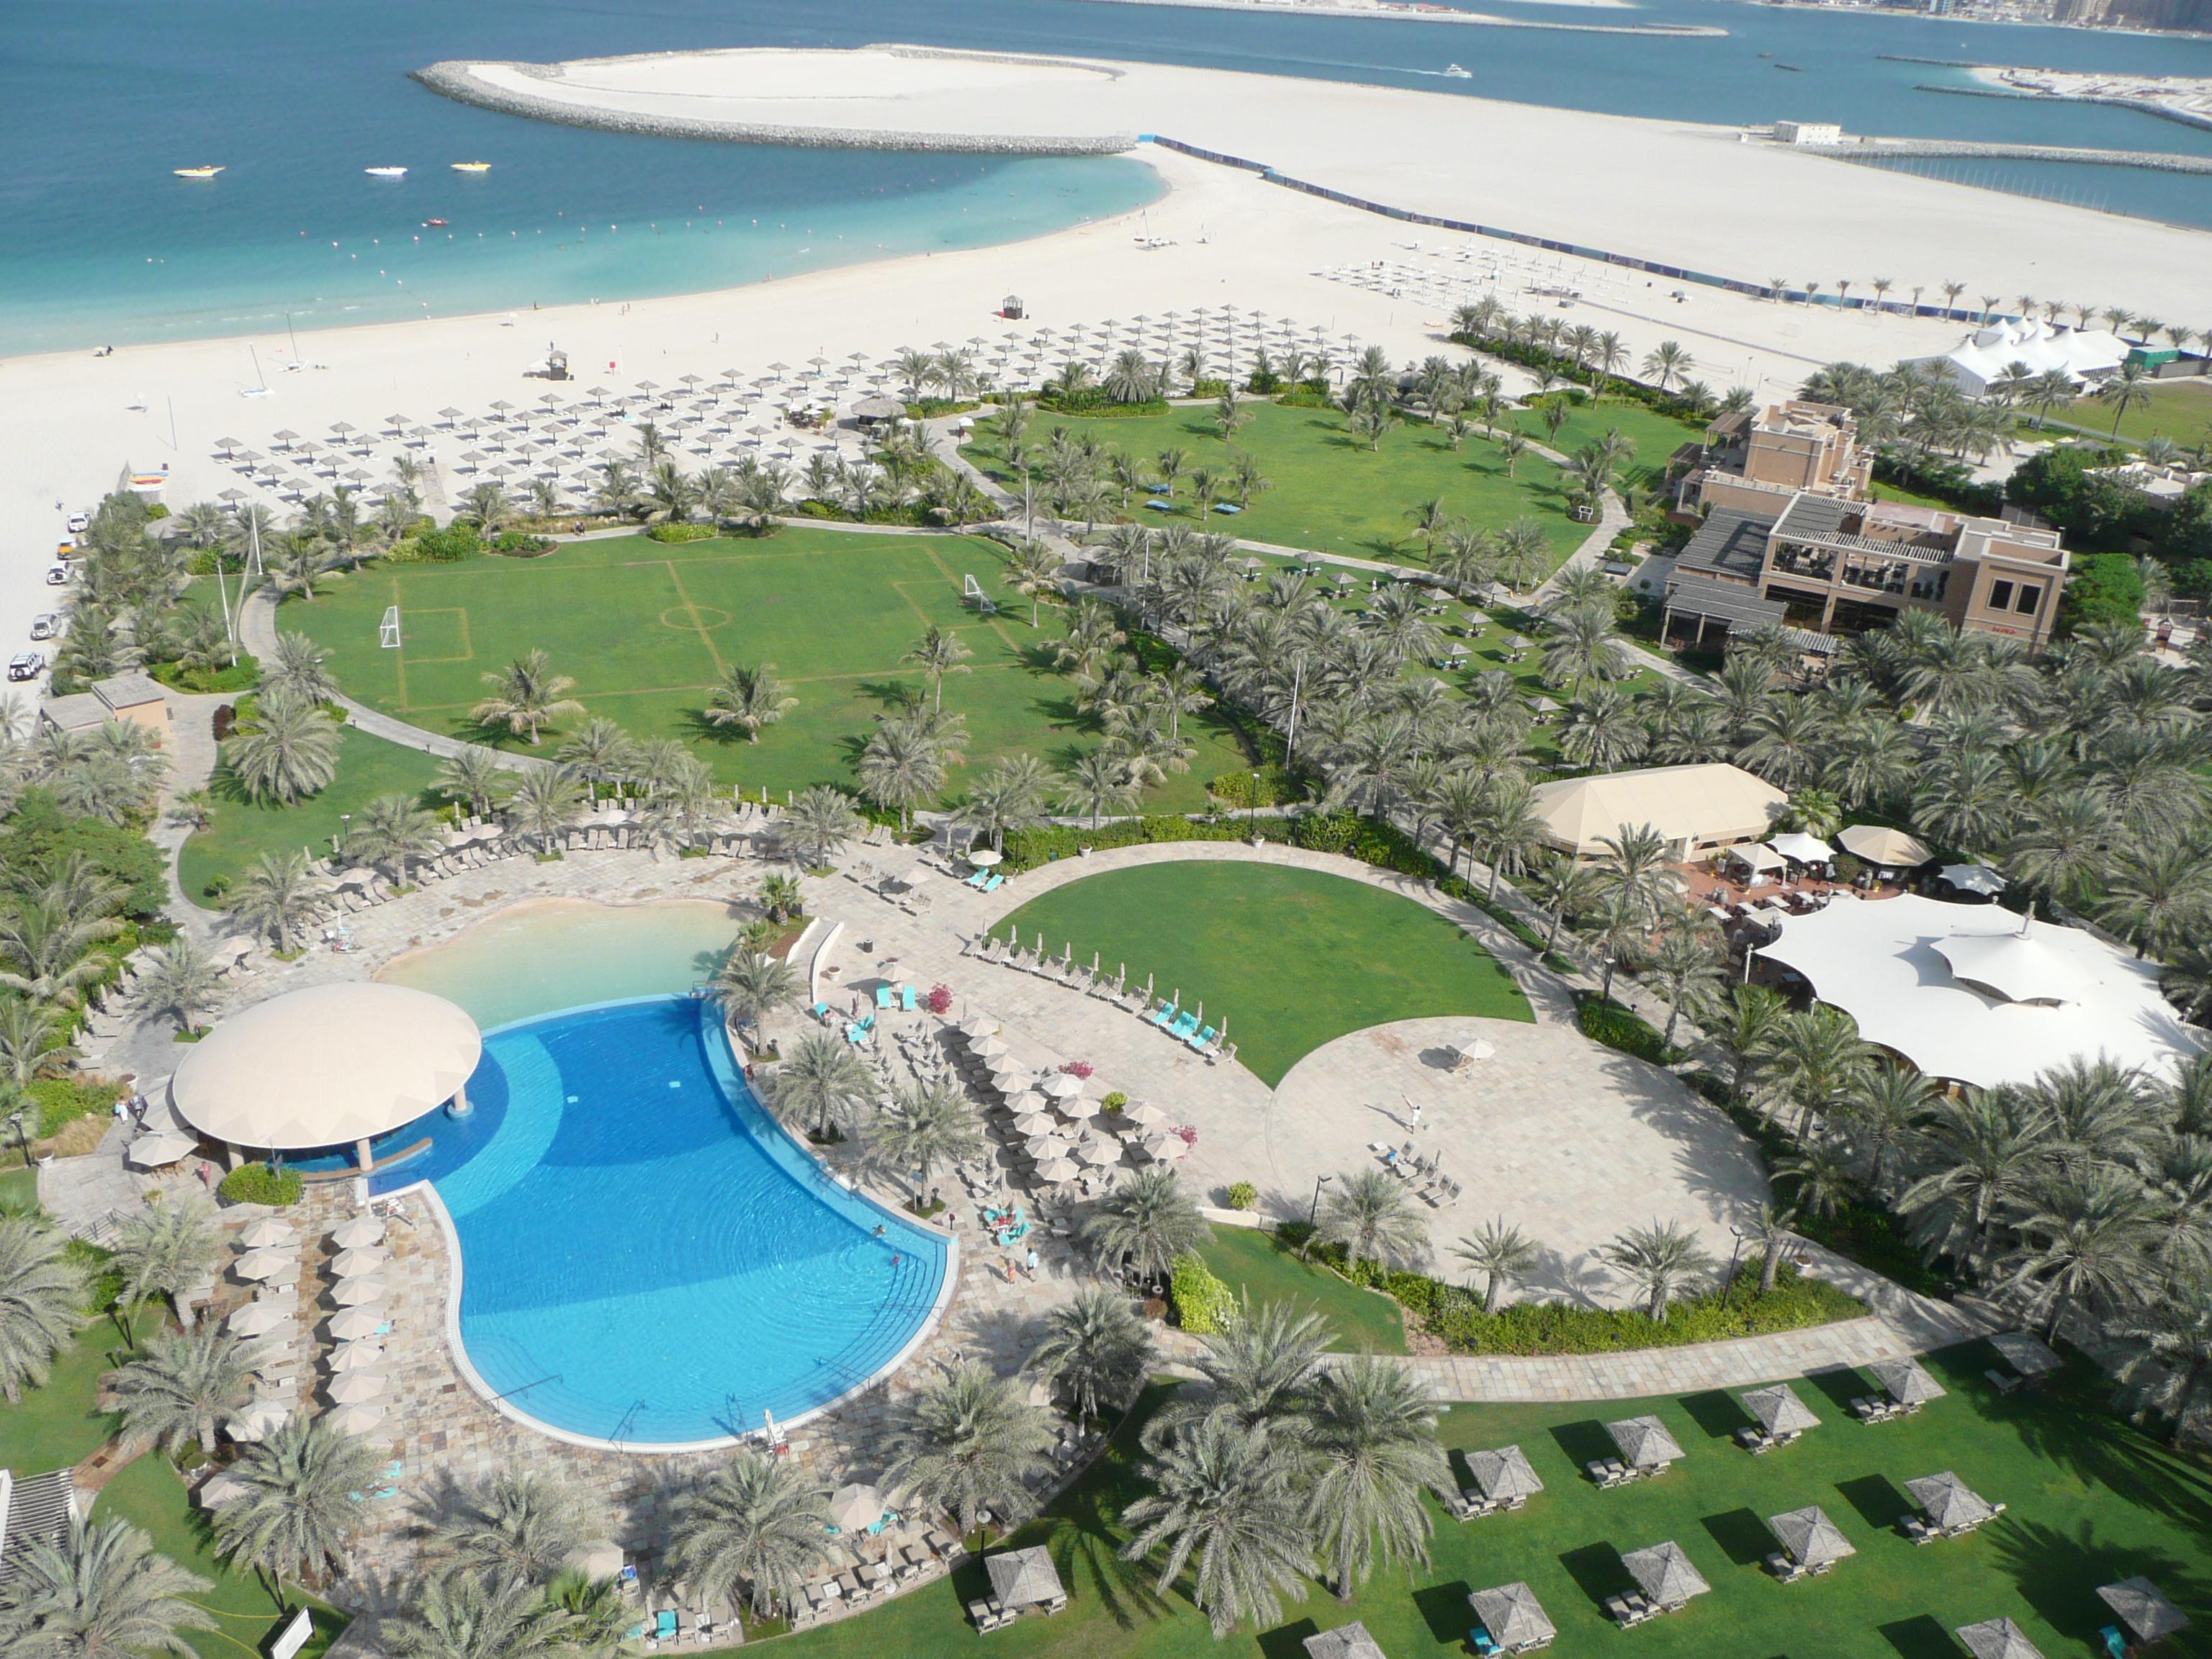 Marine Hotel Spa Offers